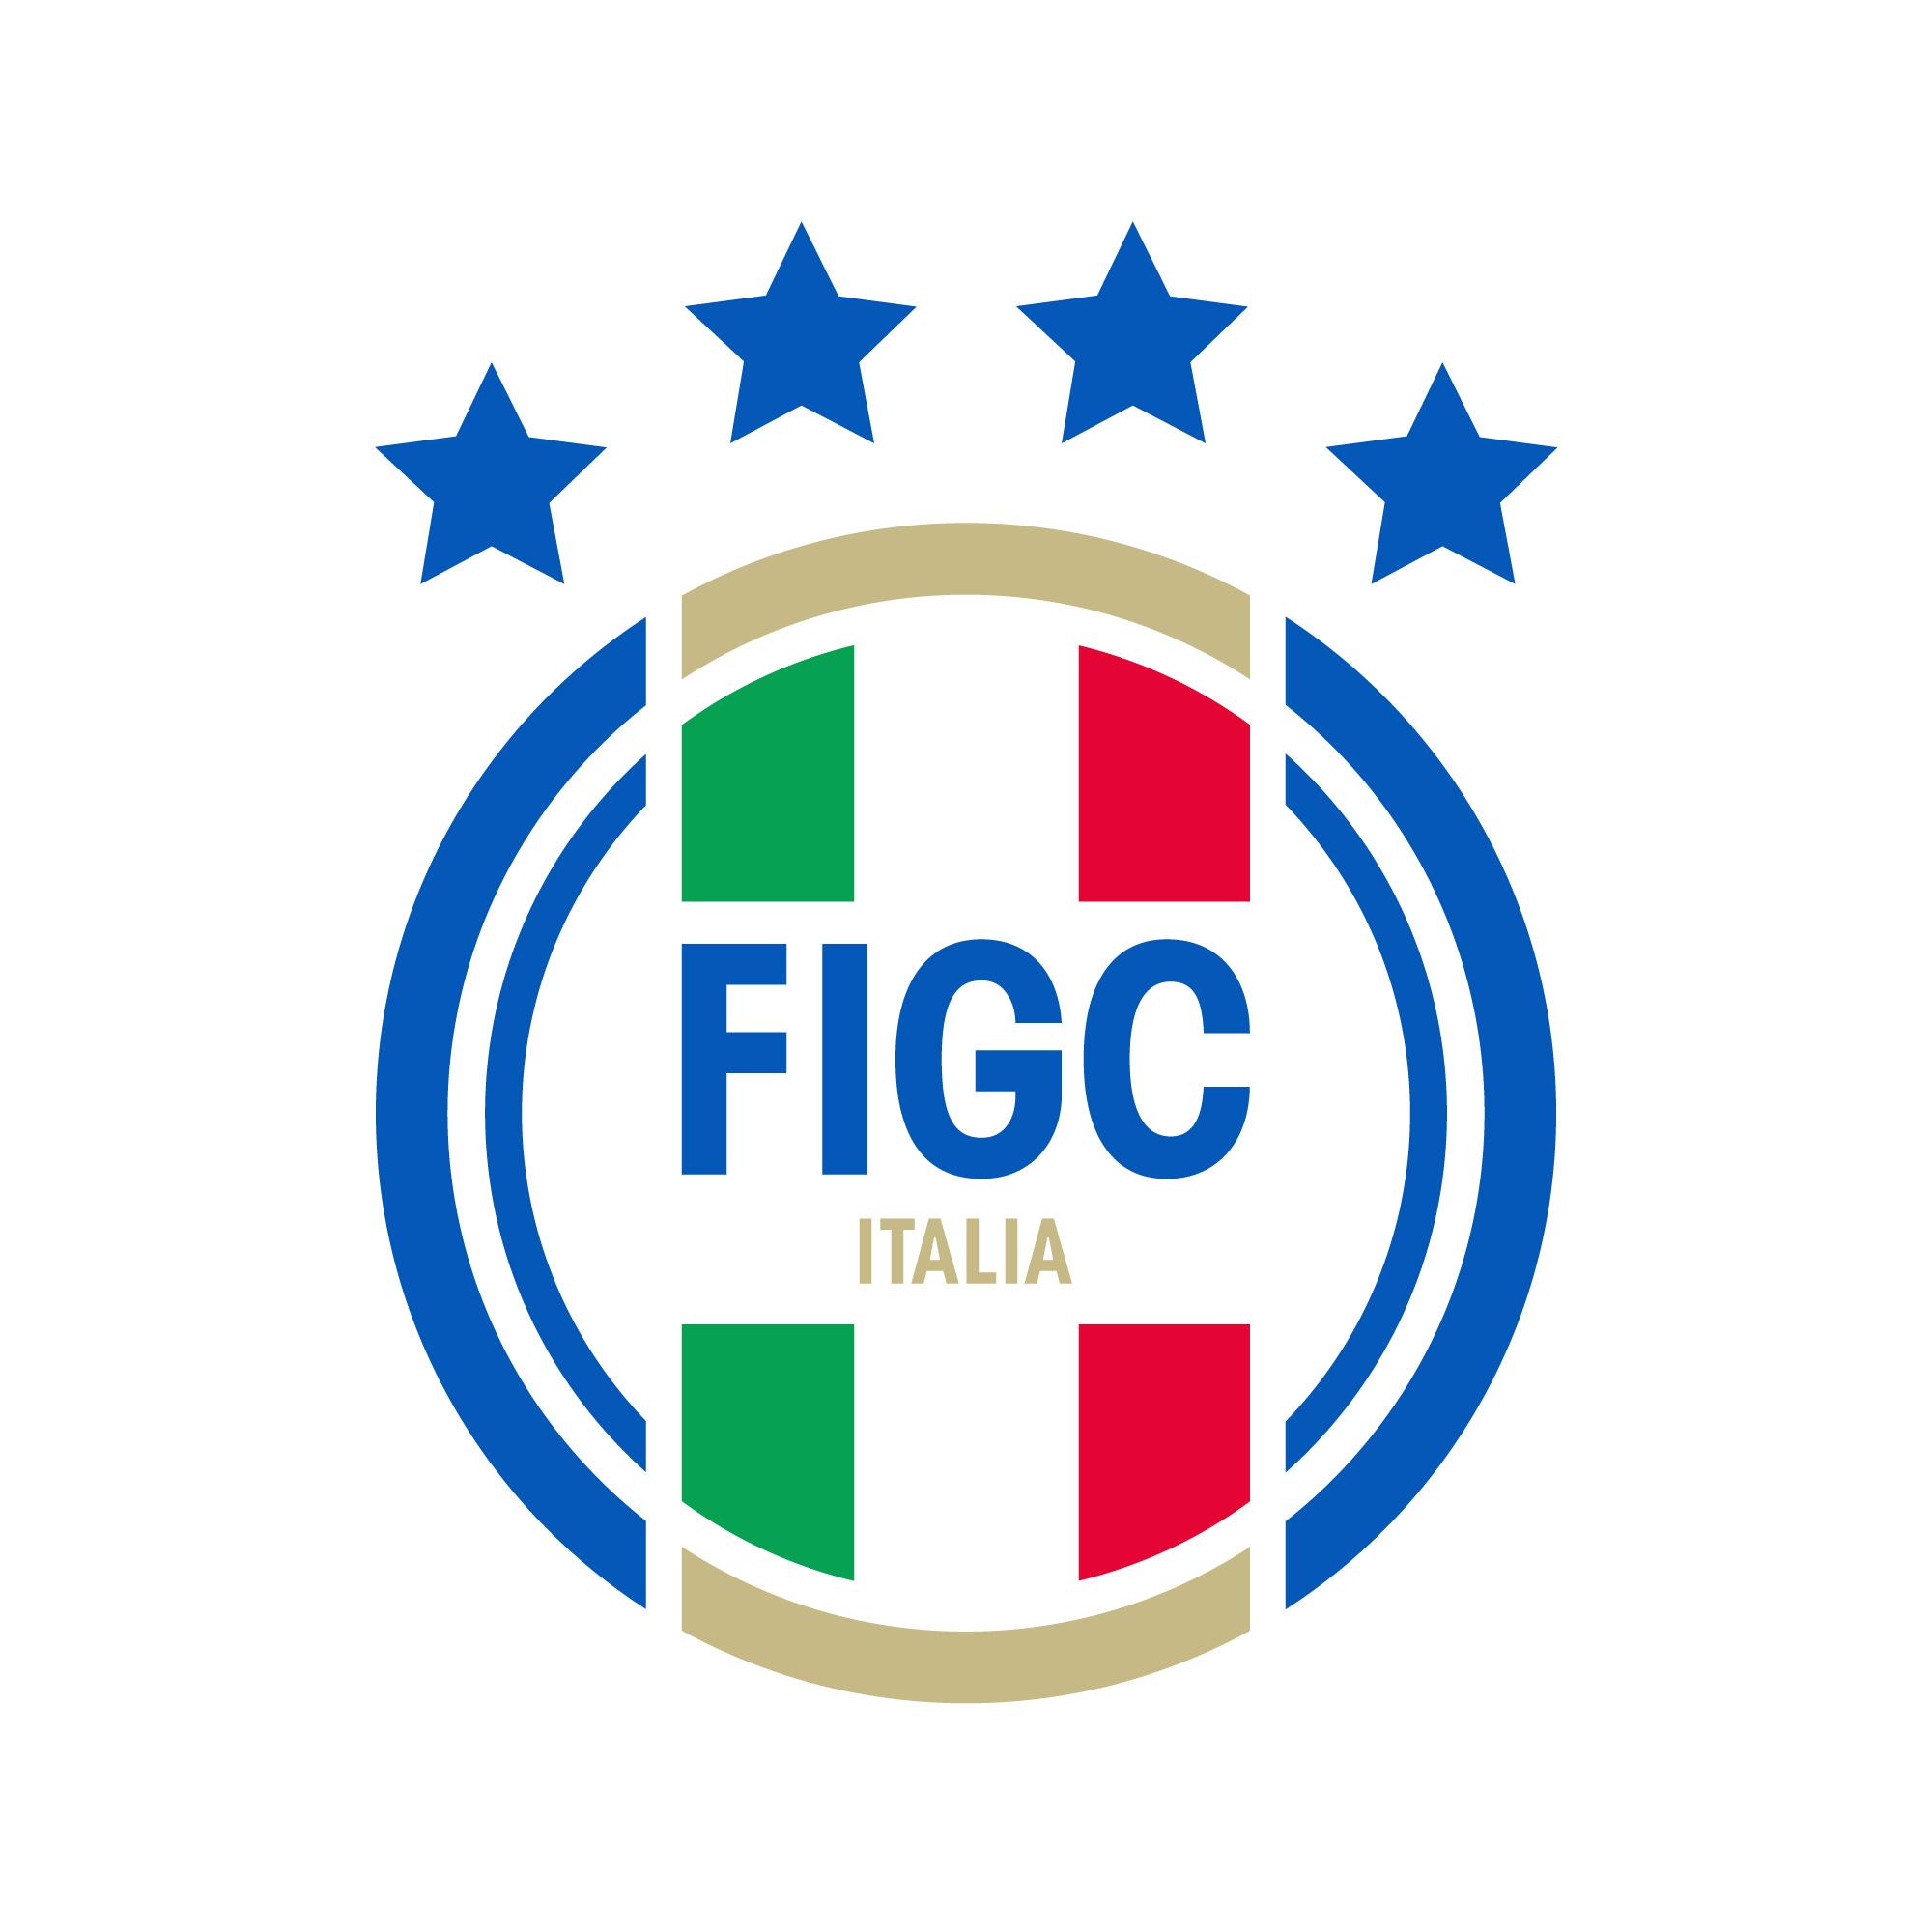 italia azzurri new figc italy logo